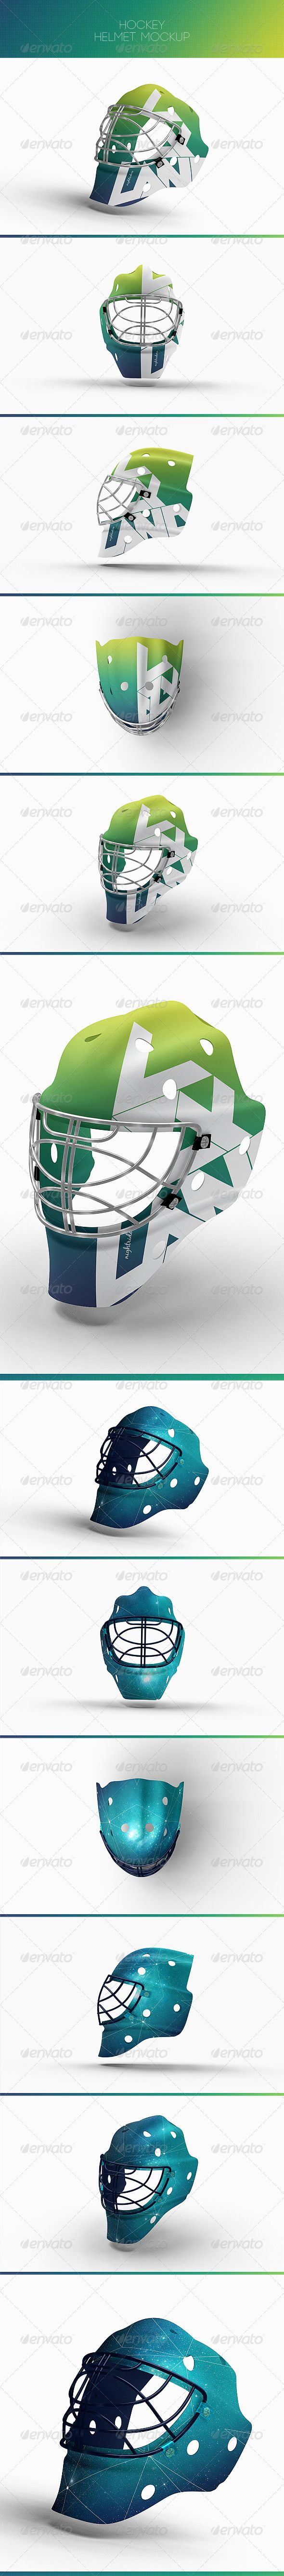 Hockey Helmet Mock-Up | #hockeymockup | Download: http://graphicriver.net/item/hockey-helmet-mockup/8524361?ref=ksioks